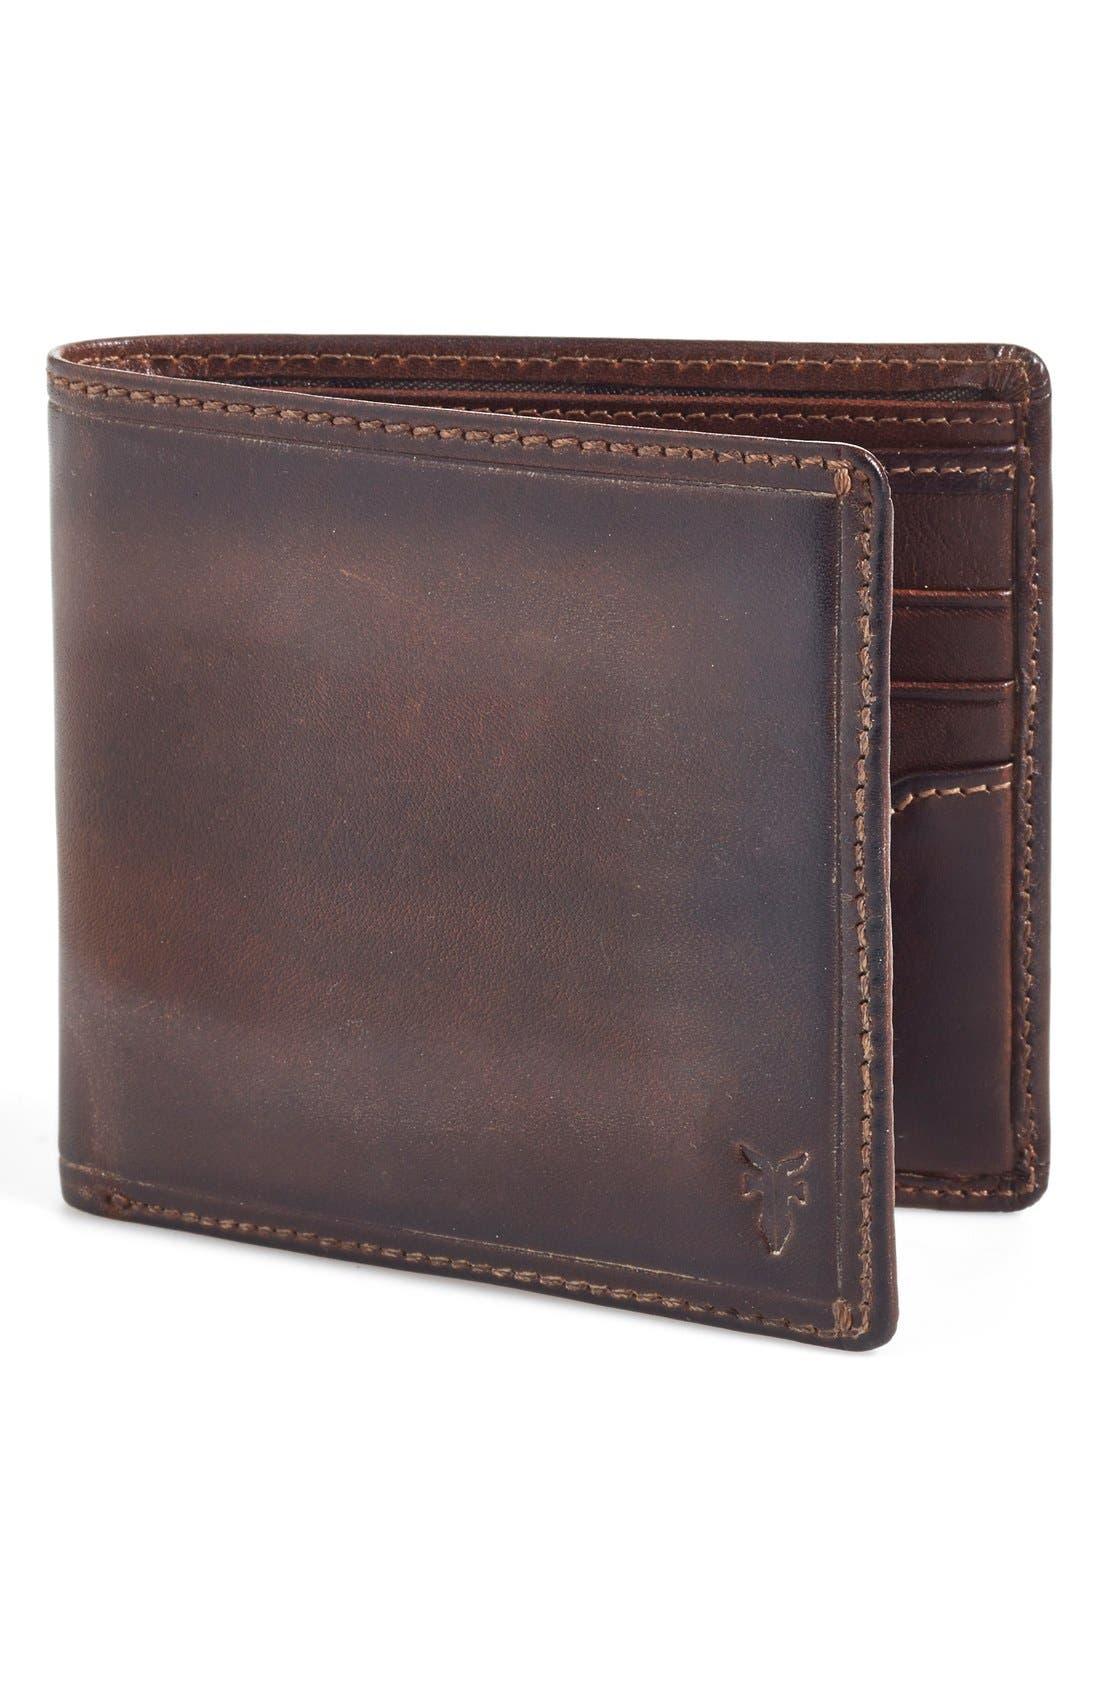 'Logan' Leather Billfold Wallet,                             Main thumbnail 1, color,                             SLATE